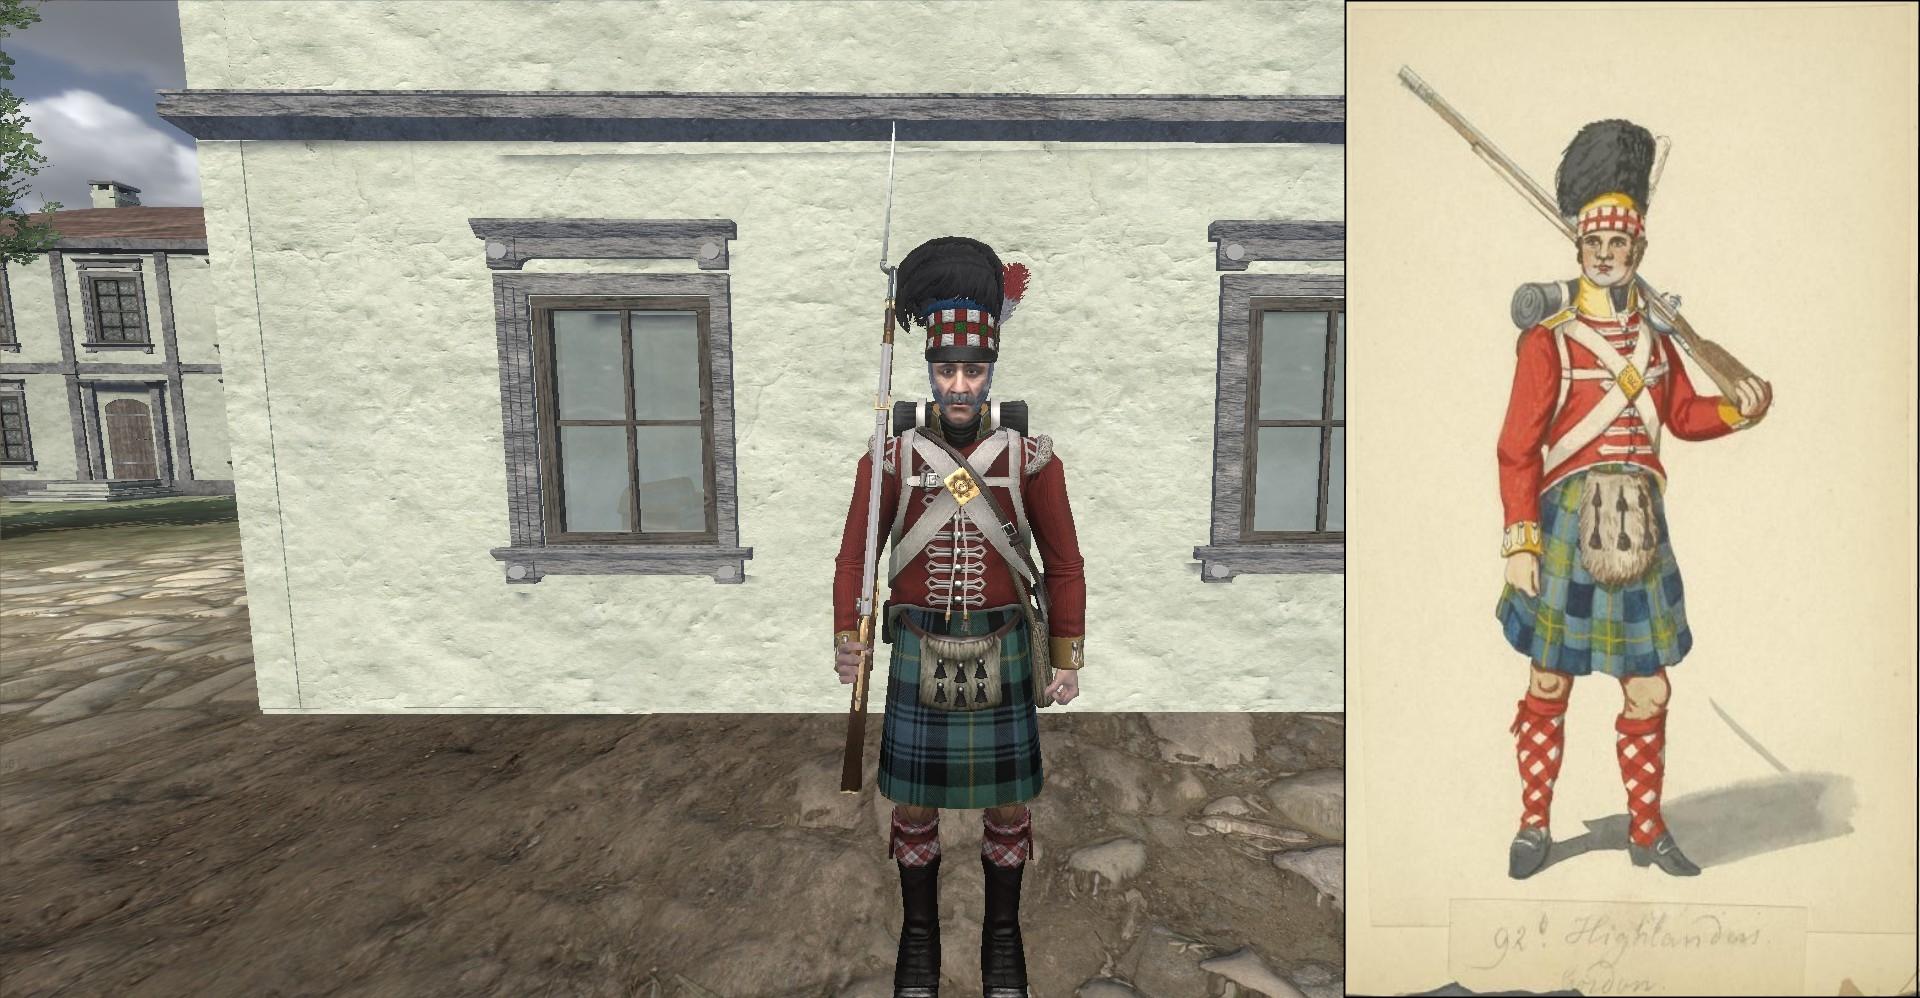 92nd gordon highlanders